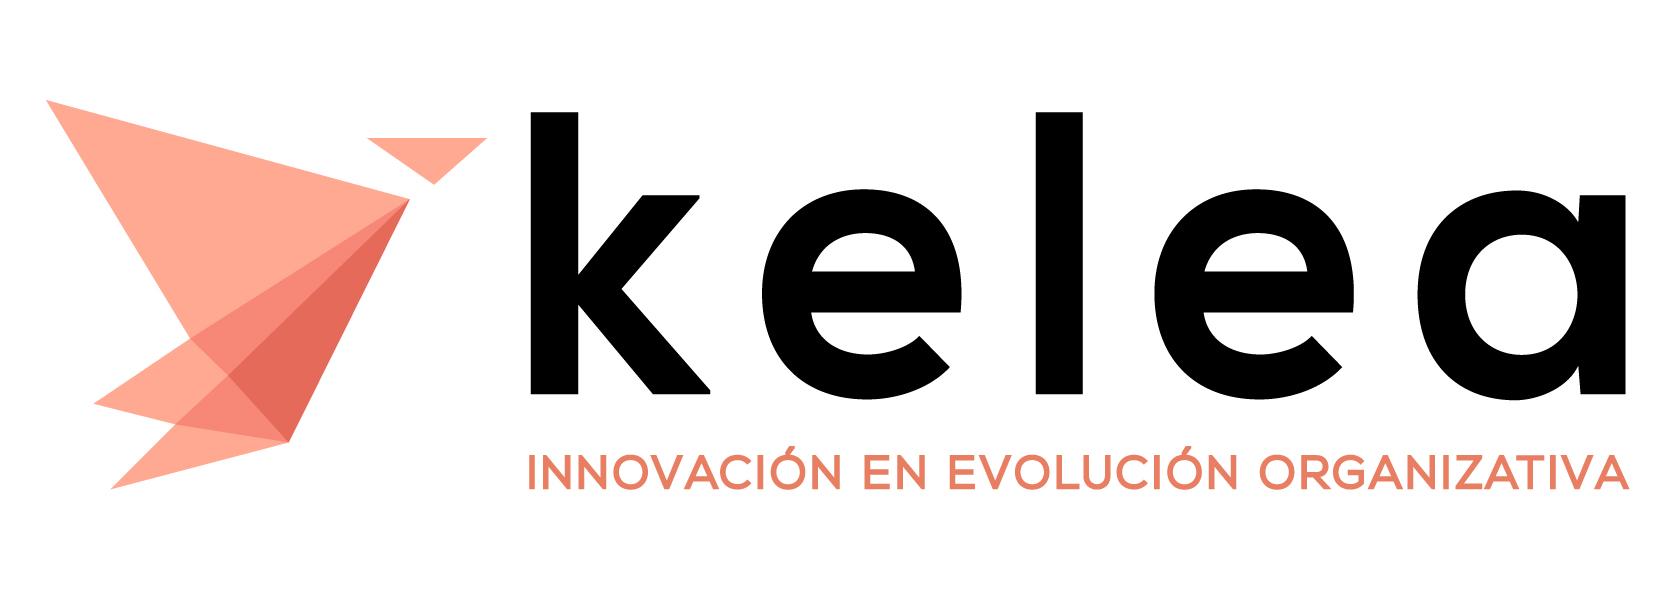 Kelea-1-logo